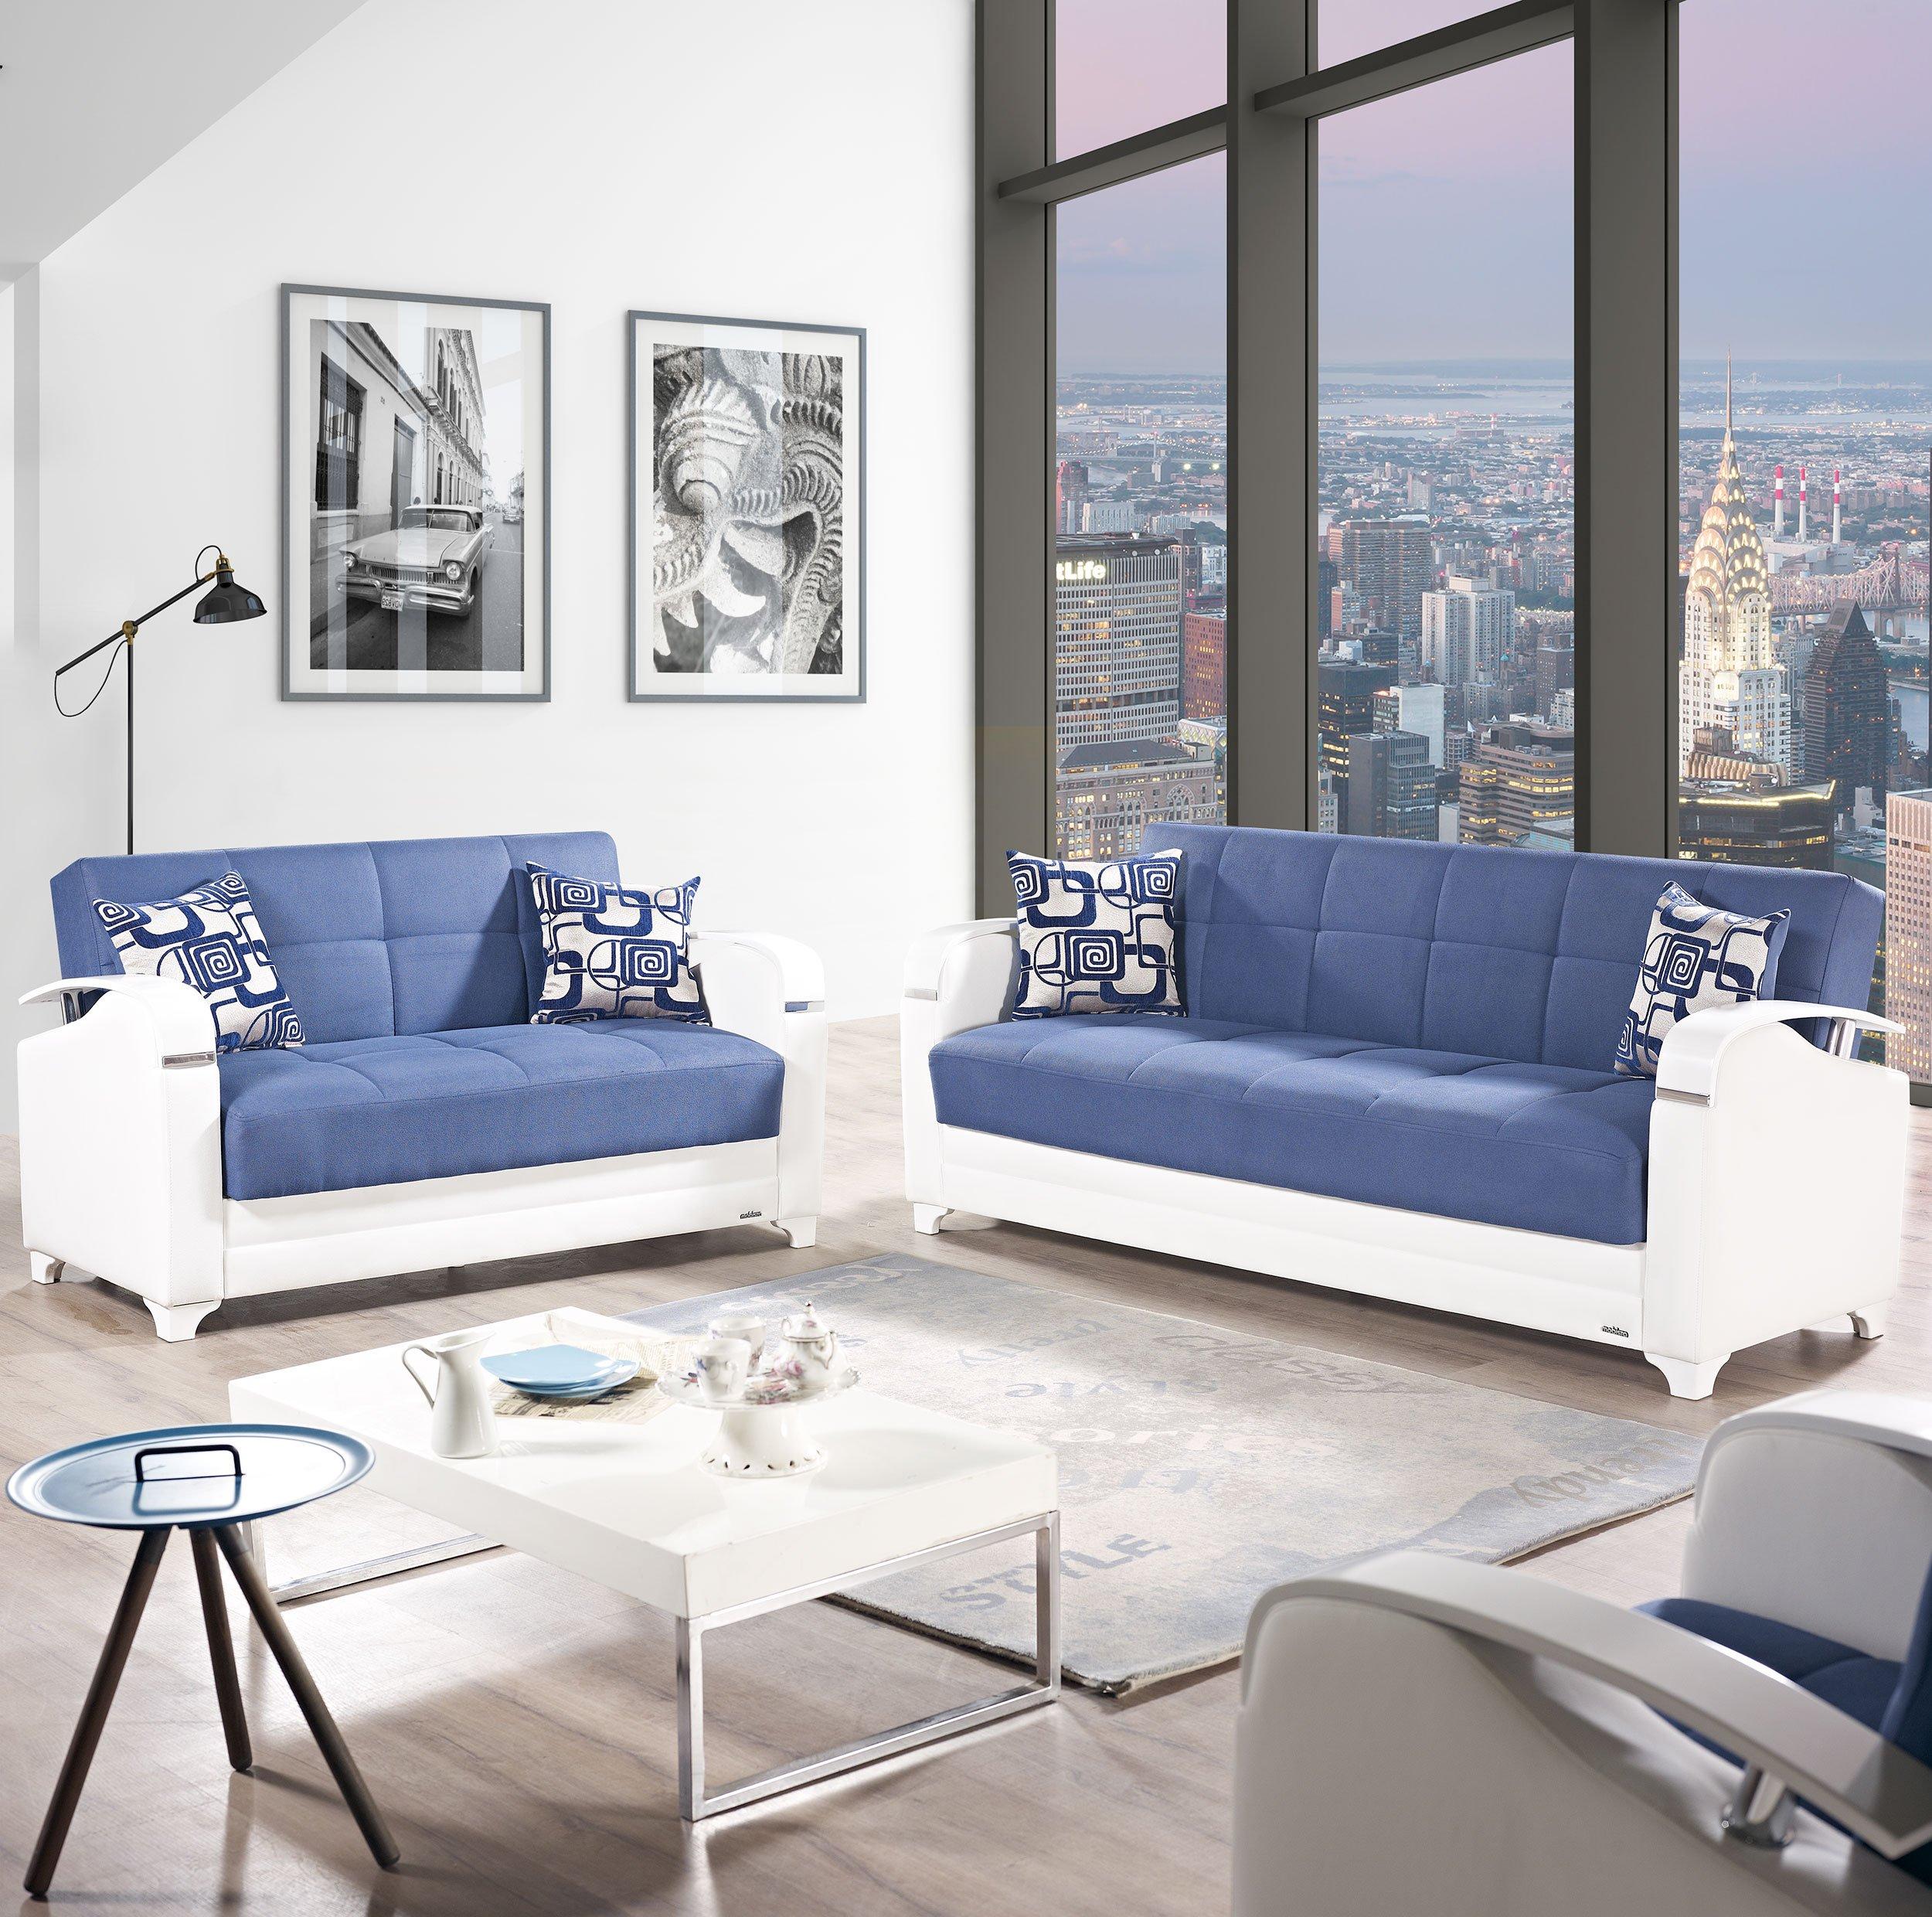 Sleeper Sofa Navy Blue: Etro Vintage Navy Blue Fabric Sofa Bed By Mobista